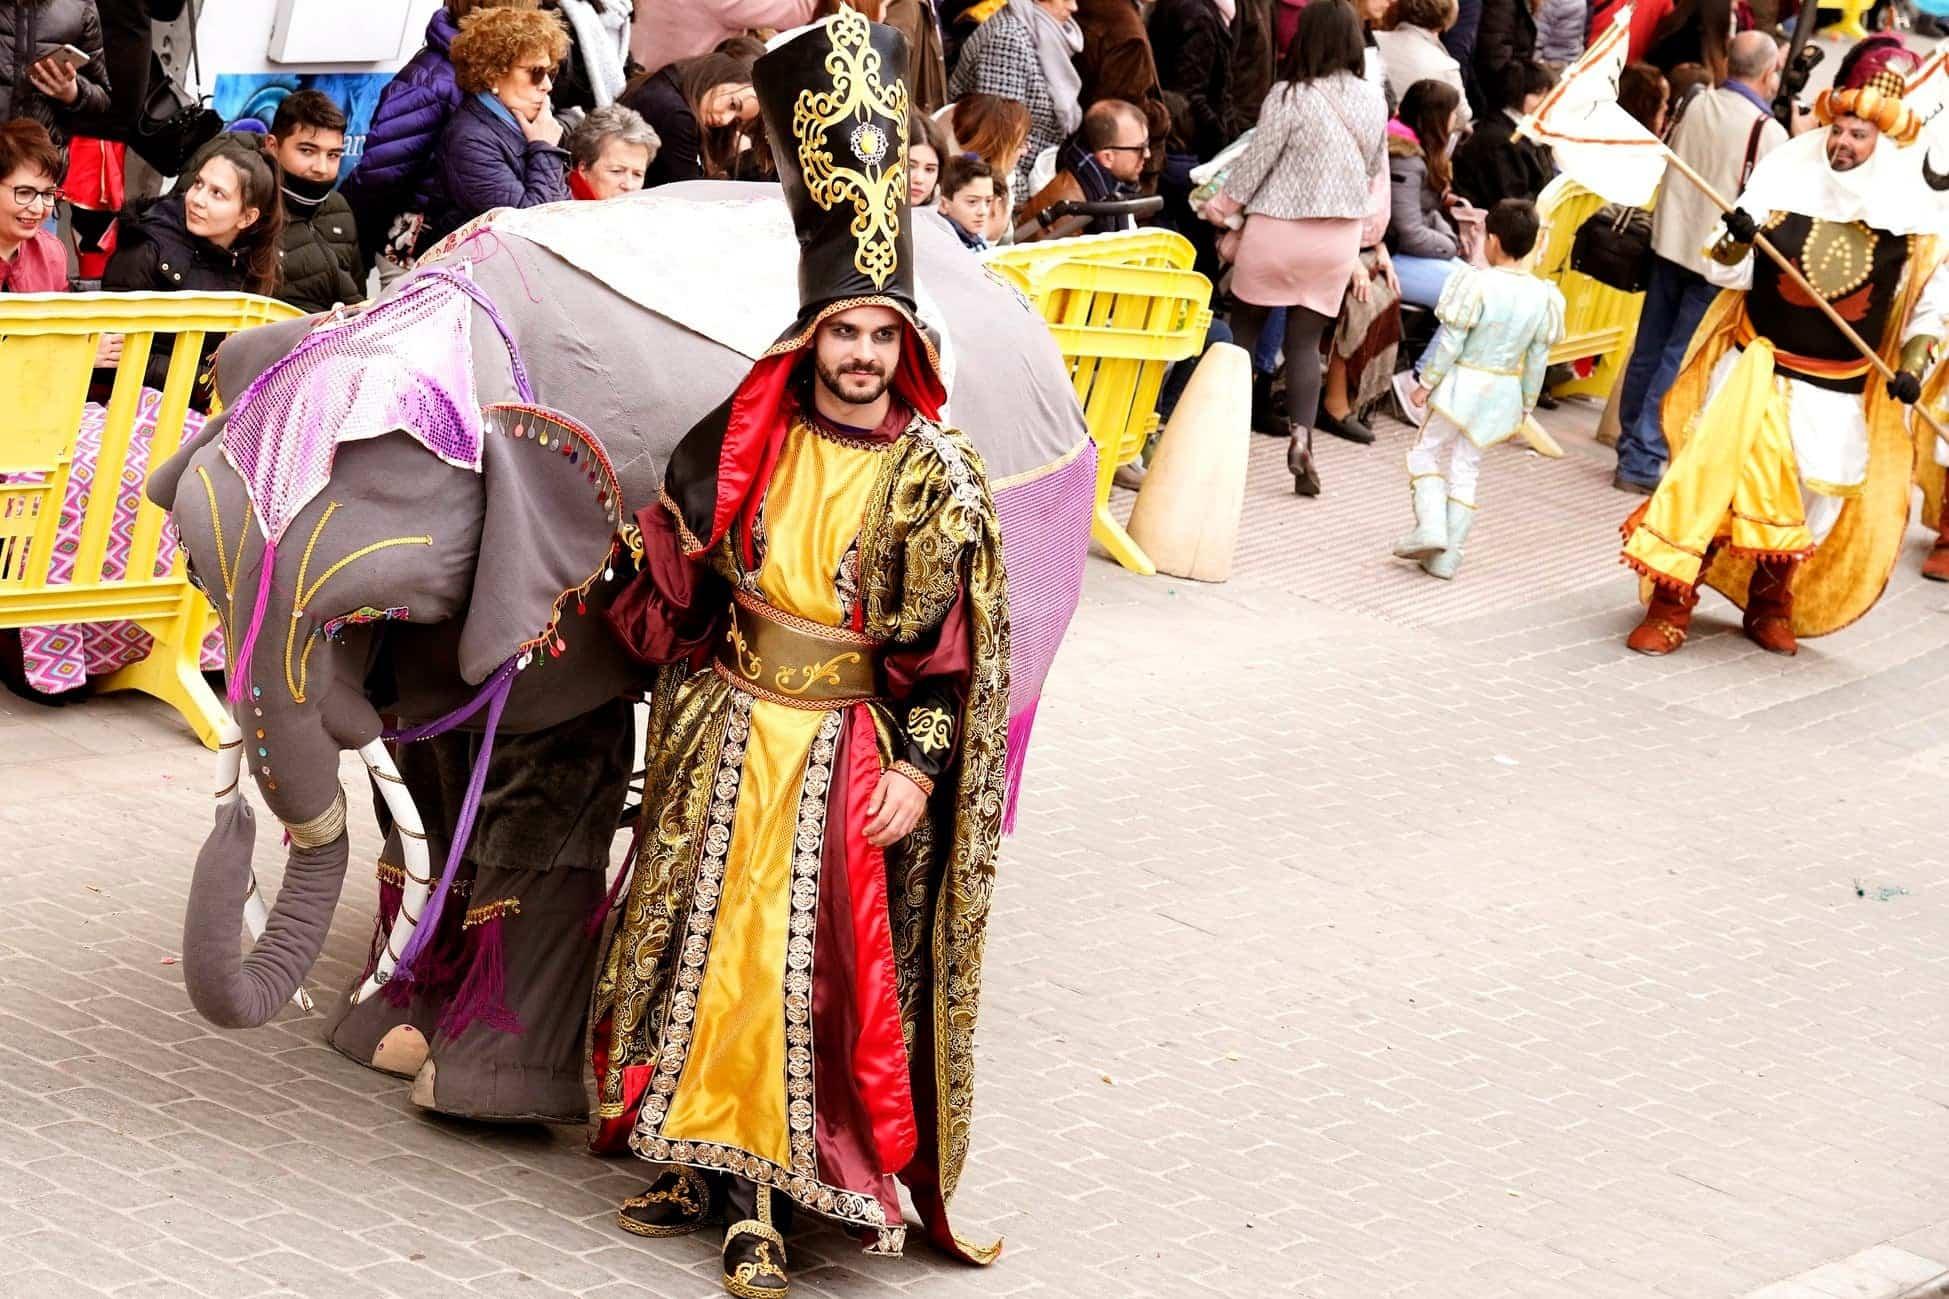 Carnaval de herencia 2020 ofertorio 38 - Selección de fotografías del Ofertorio del Carnaval de Herencia